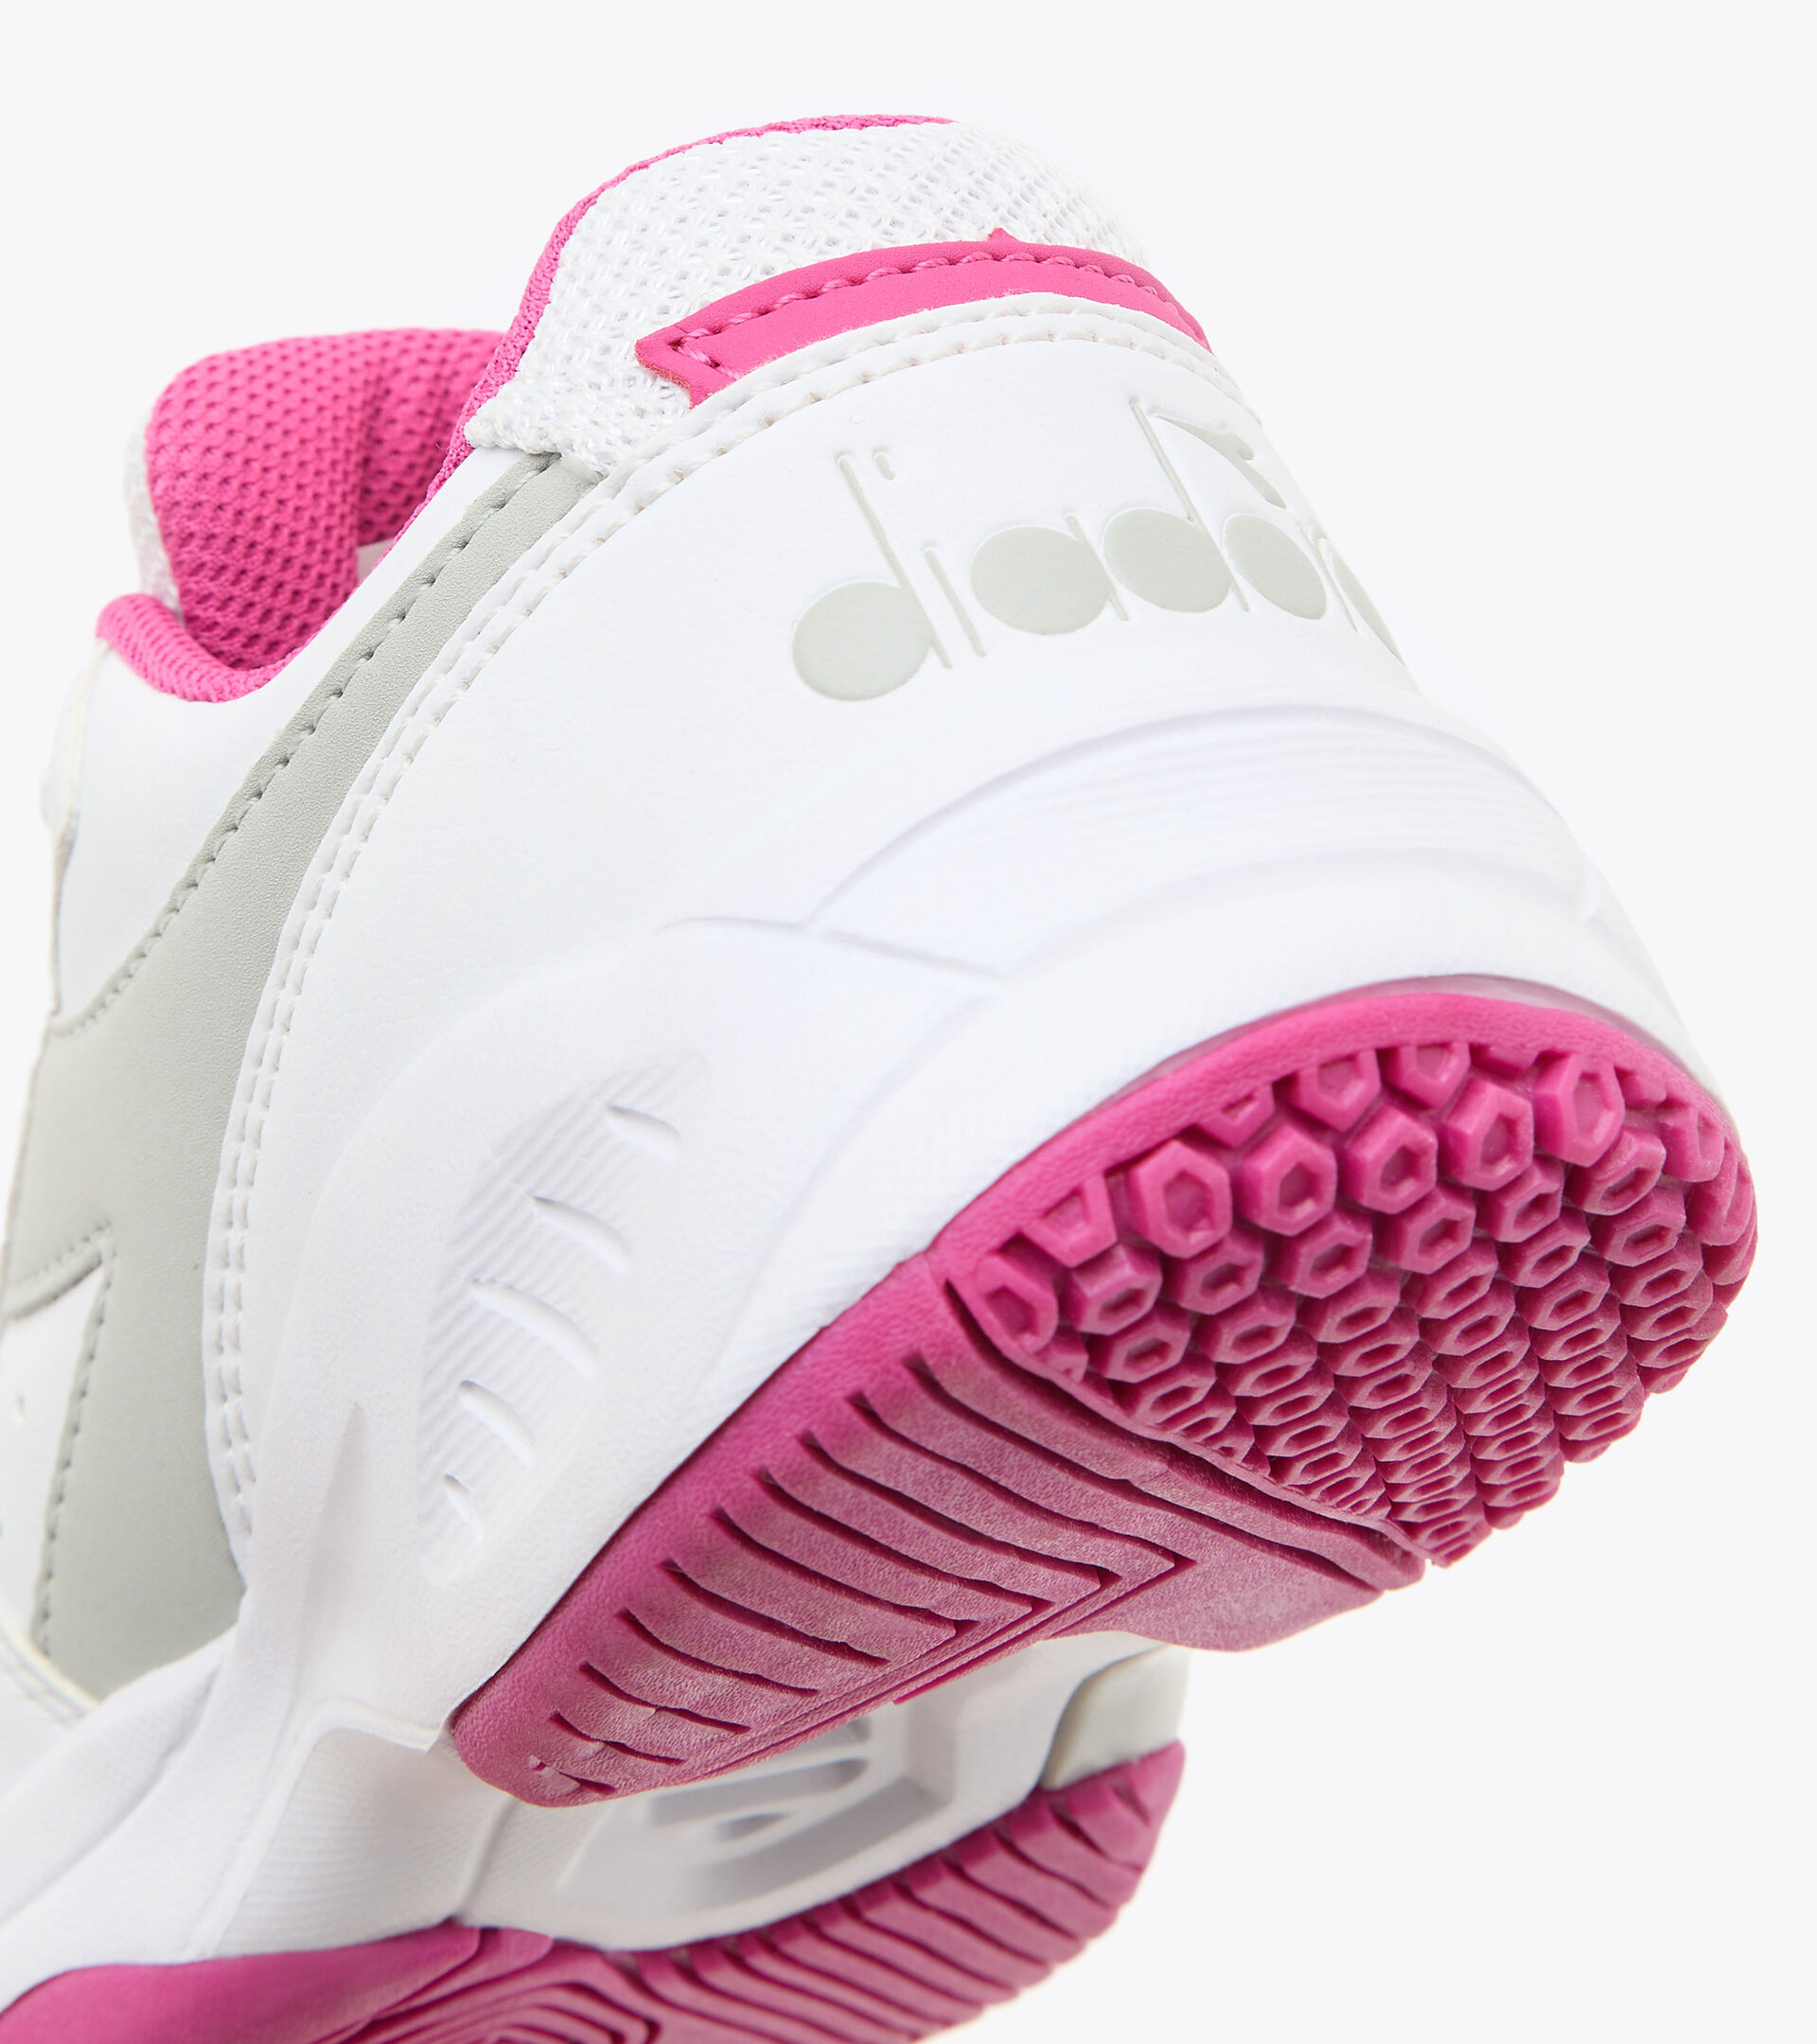 Footwear Sport BAMBINO S. CHALLENGE 3 SL JR BLANCO/ROSA IBIS Diadora